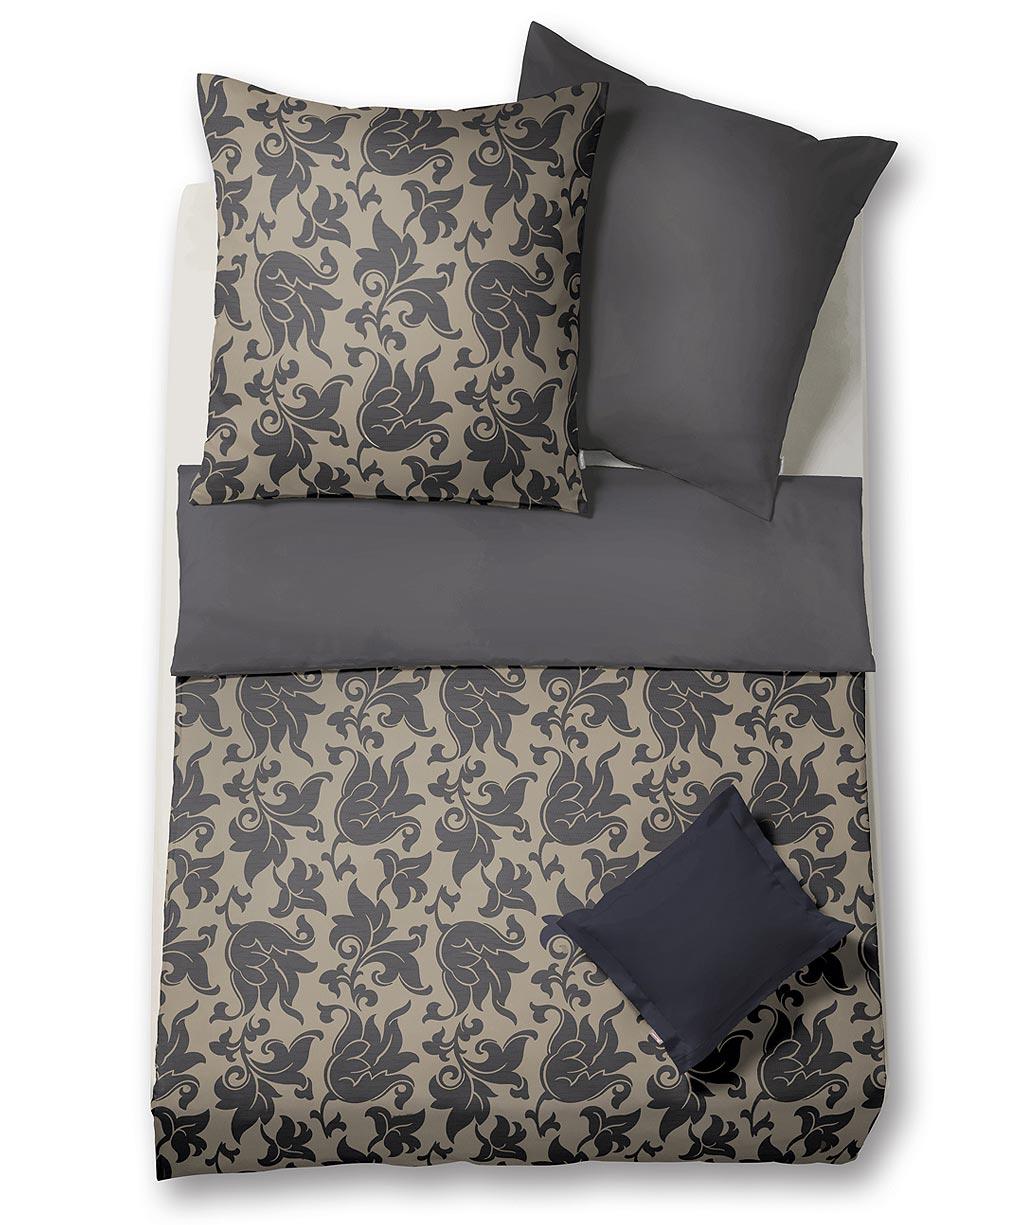 Buntgewebte Brokat Damast Kissenhülle mit floralem Design